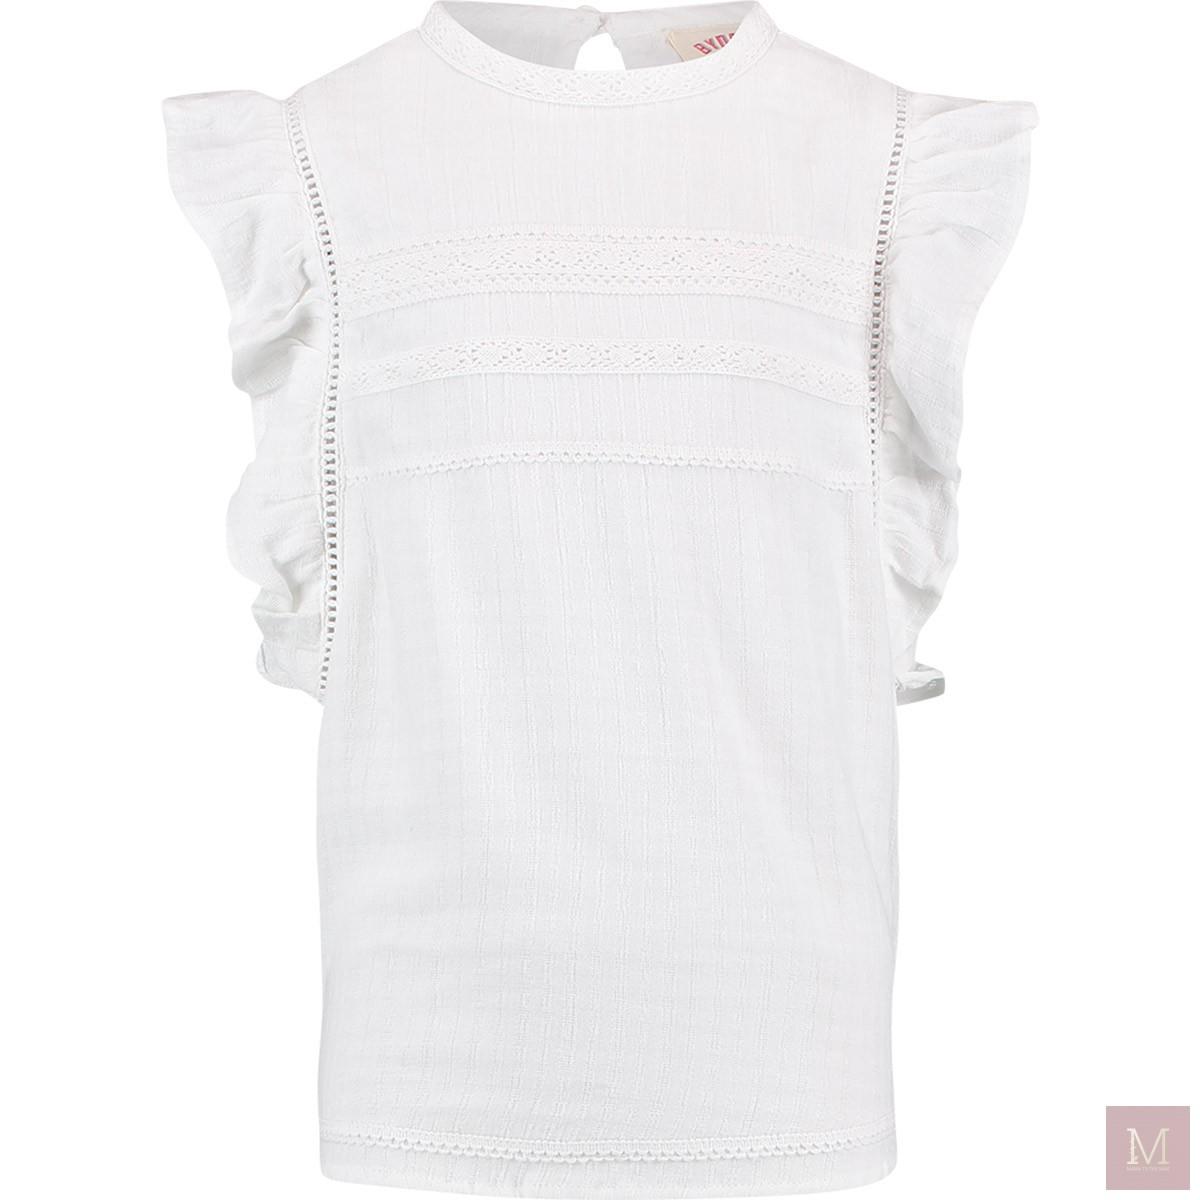 Vingino T-shirt, mouwloos, kleertjes.com